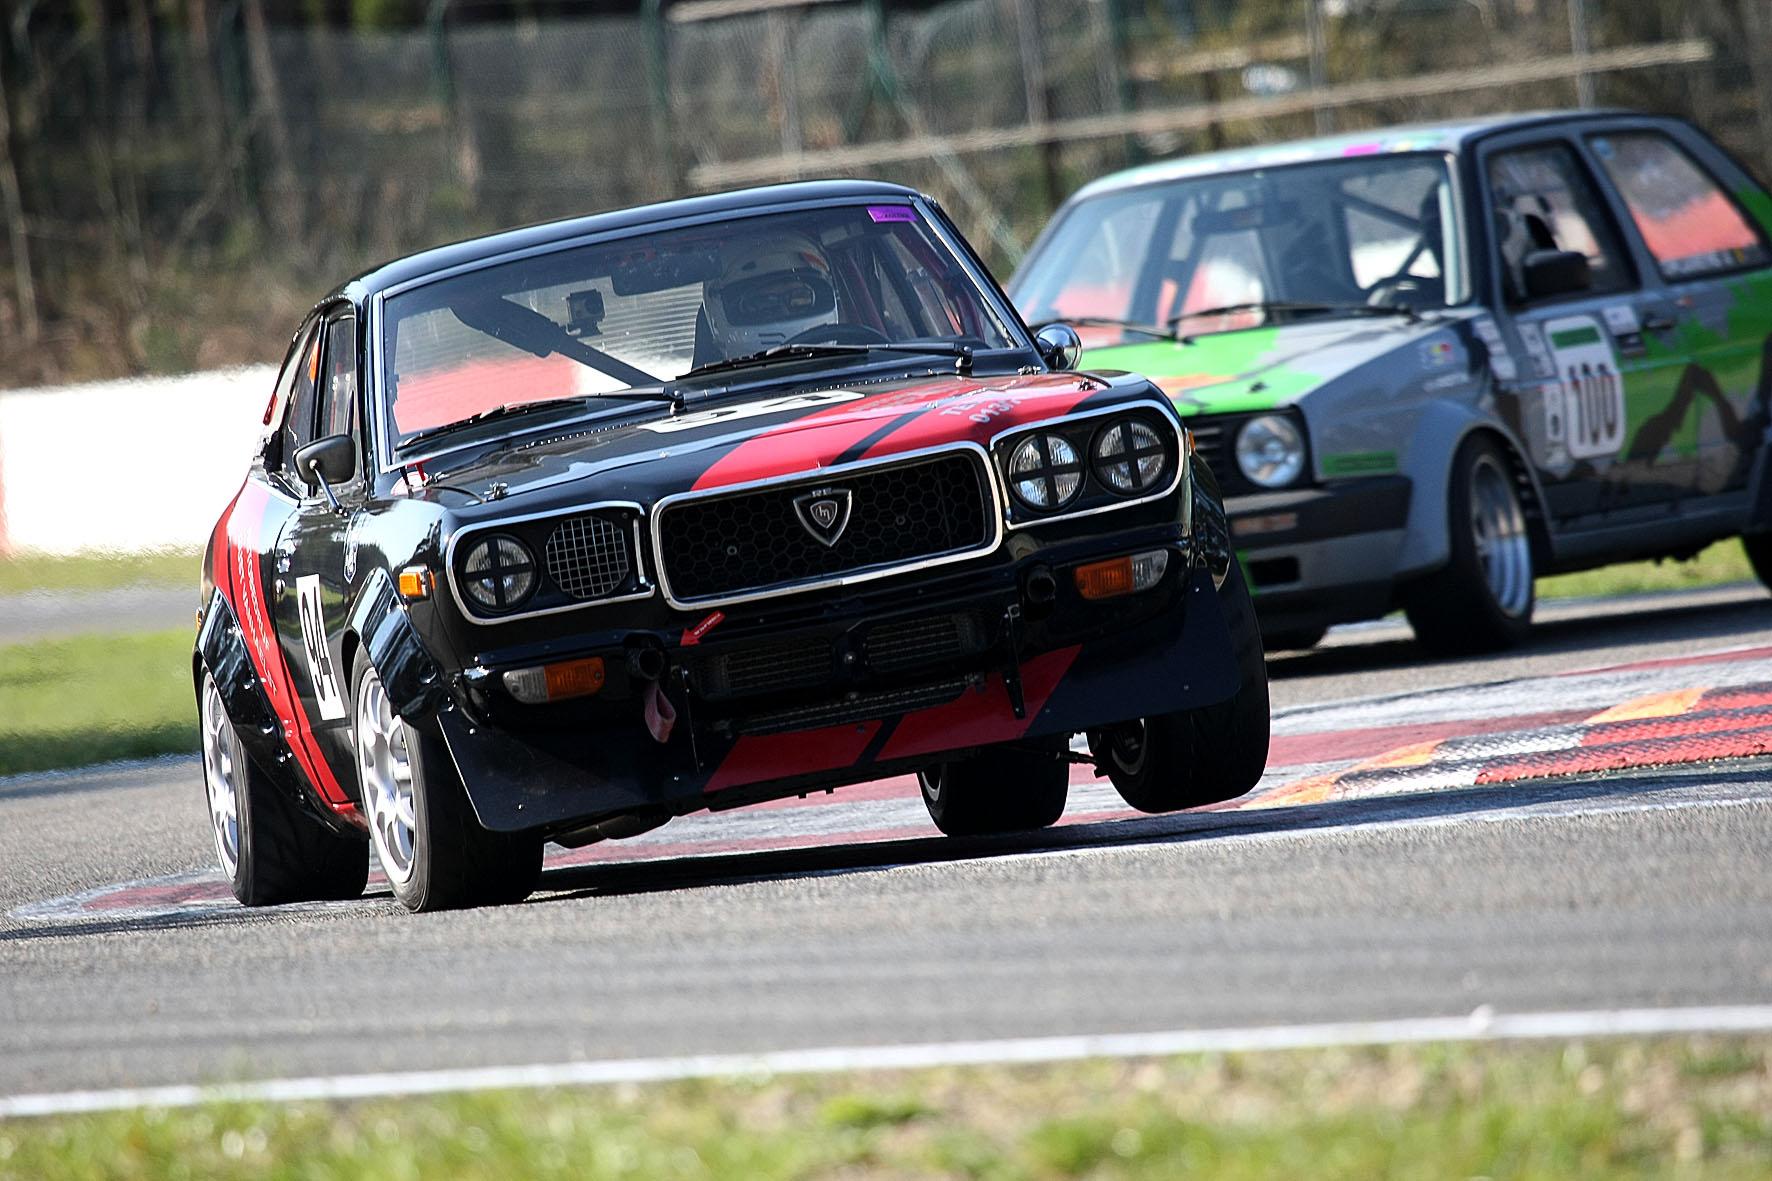 Kampioenen gekend na spannend seizoensslot op de Nürburgring